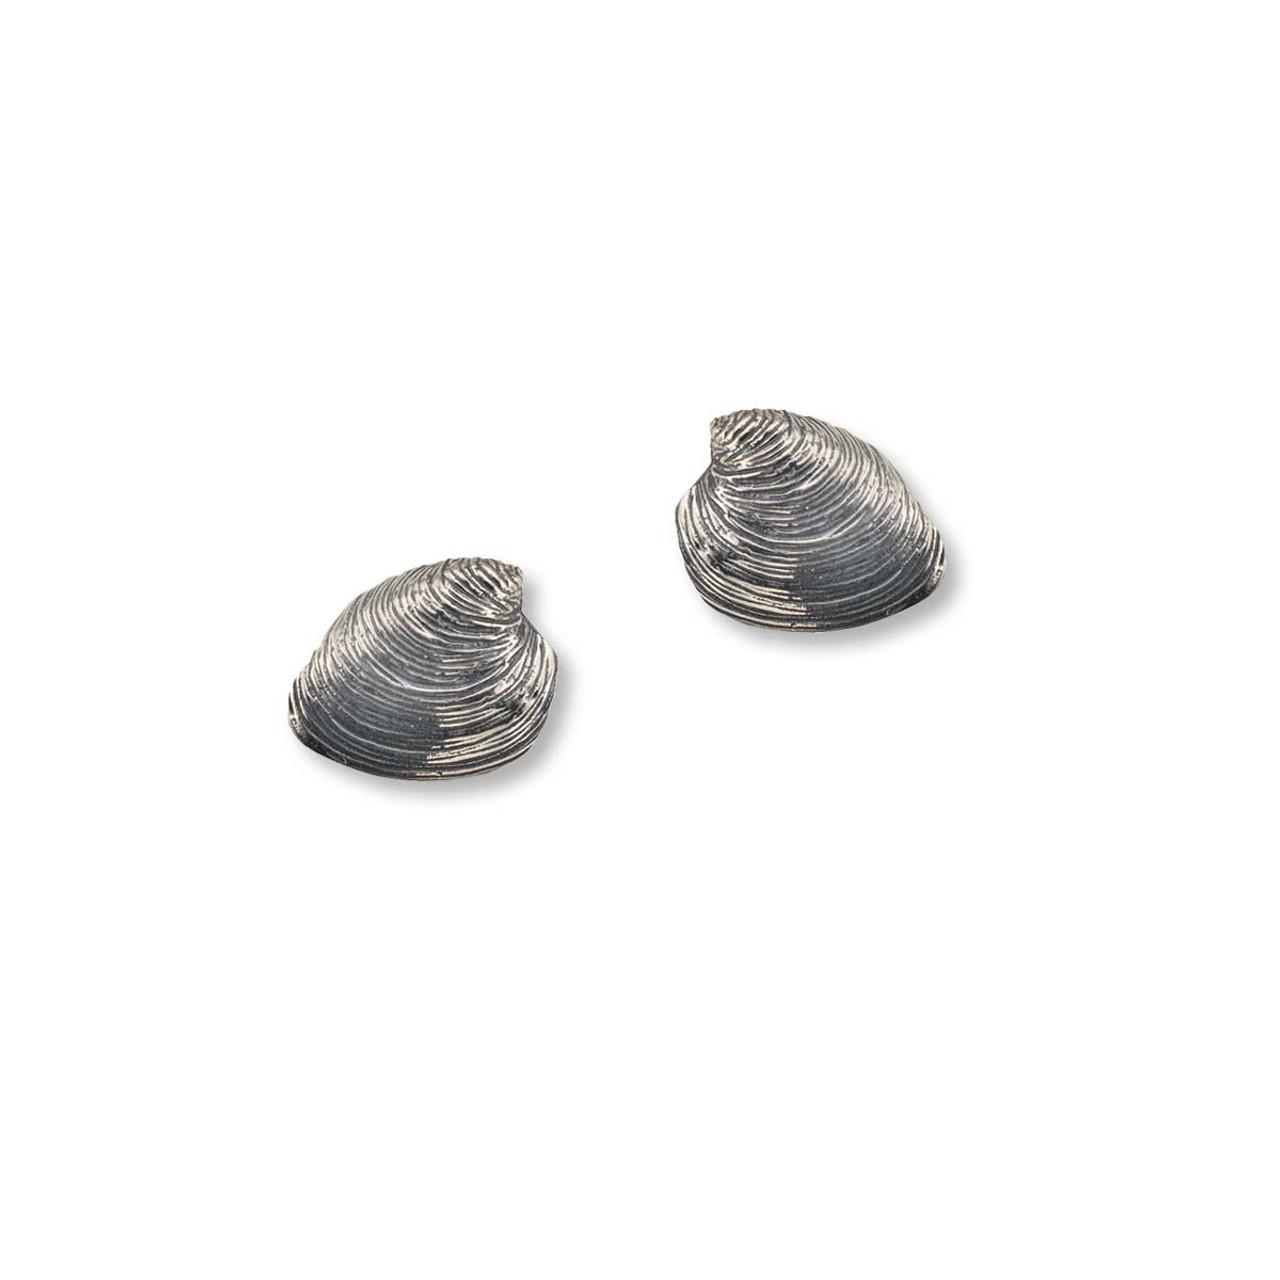 b83e3dfd4 Browse Stylish Designs of Sterling Quahog Post Earrings